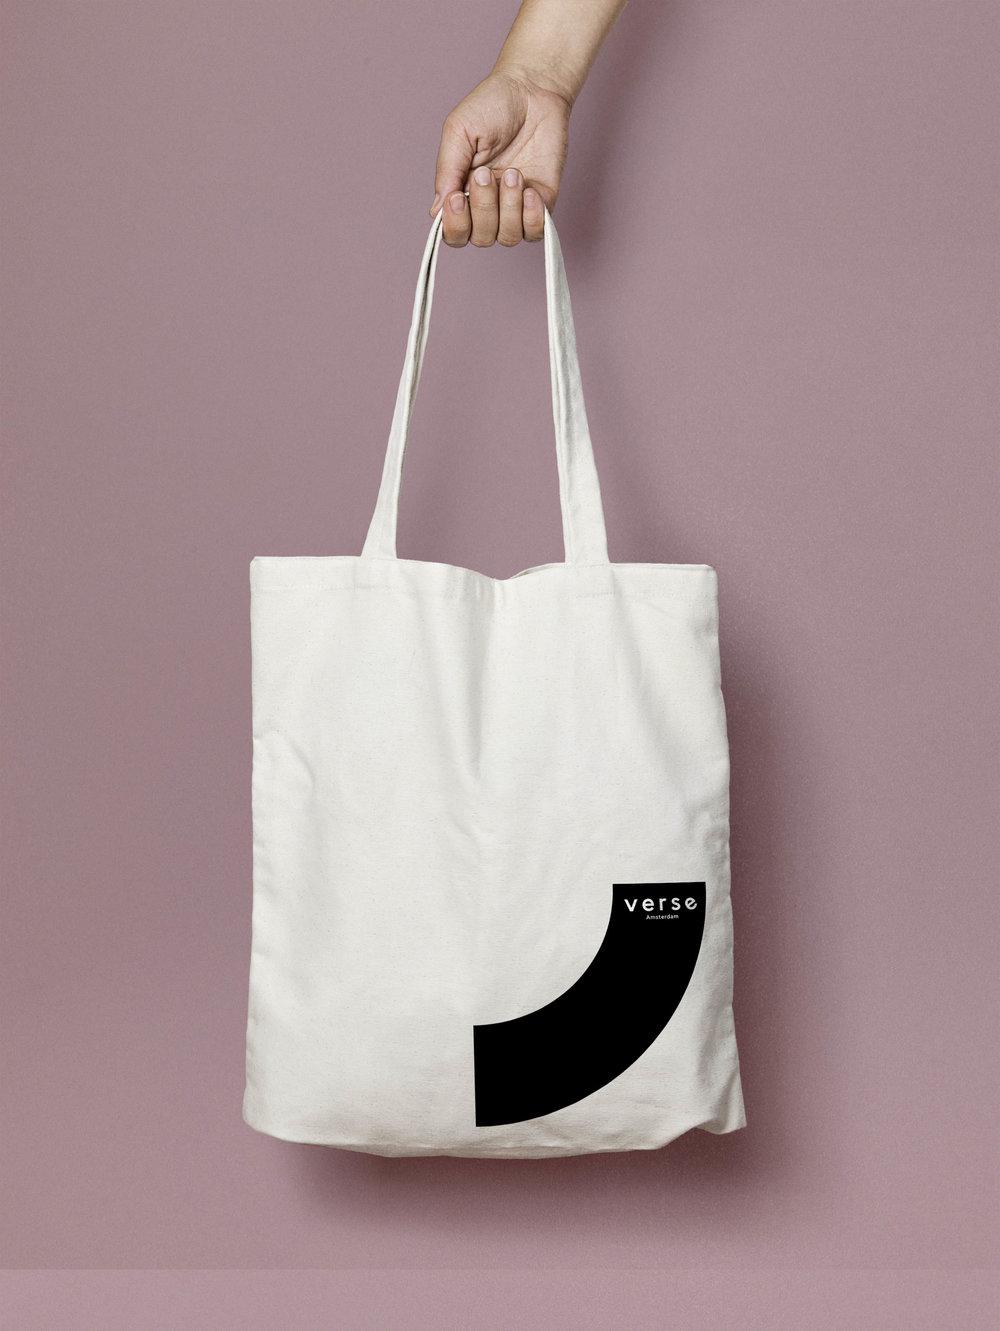 designerette.nl_VERSE_pink_canvas bag ll.jpg